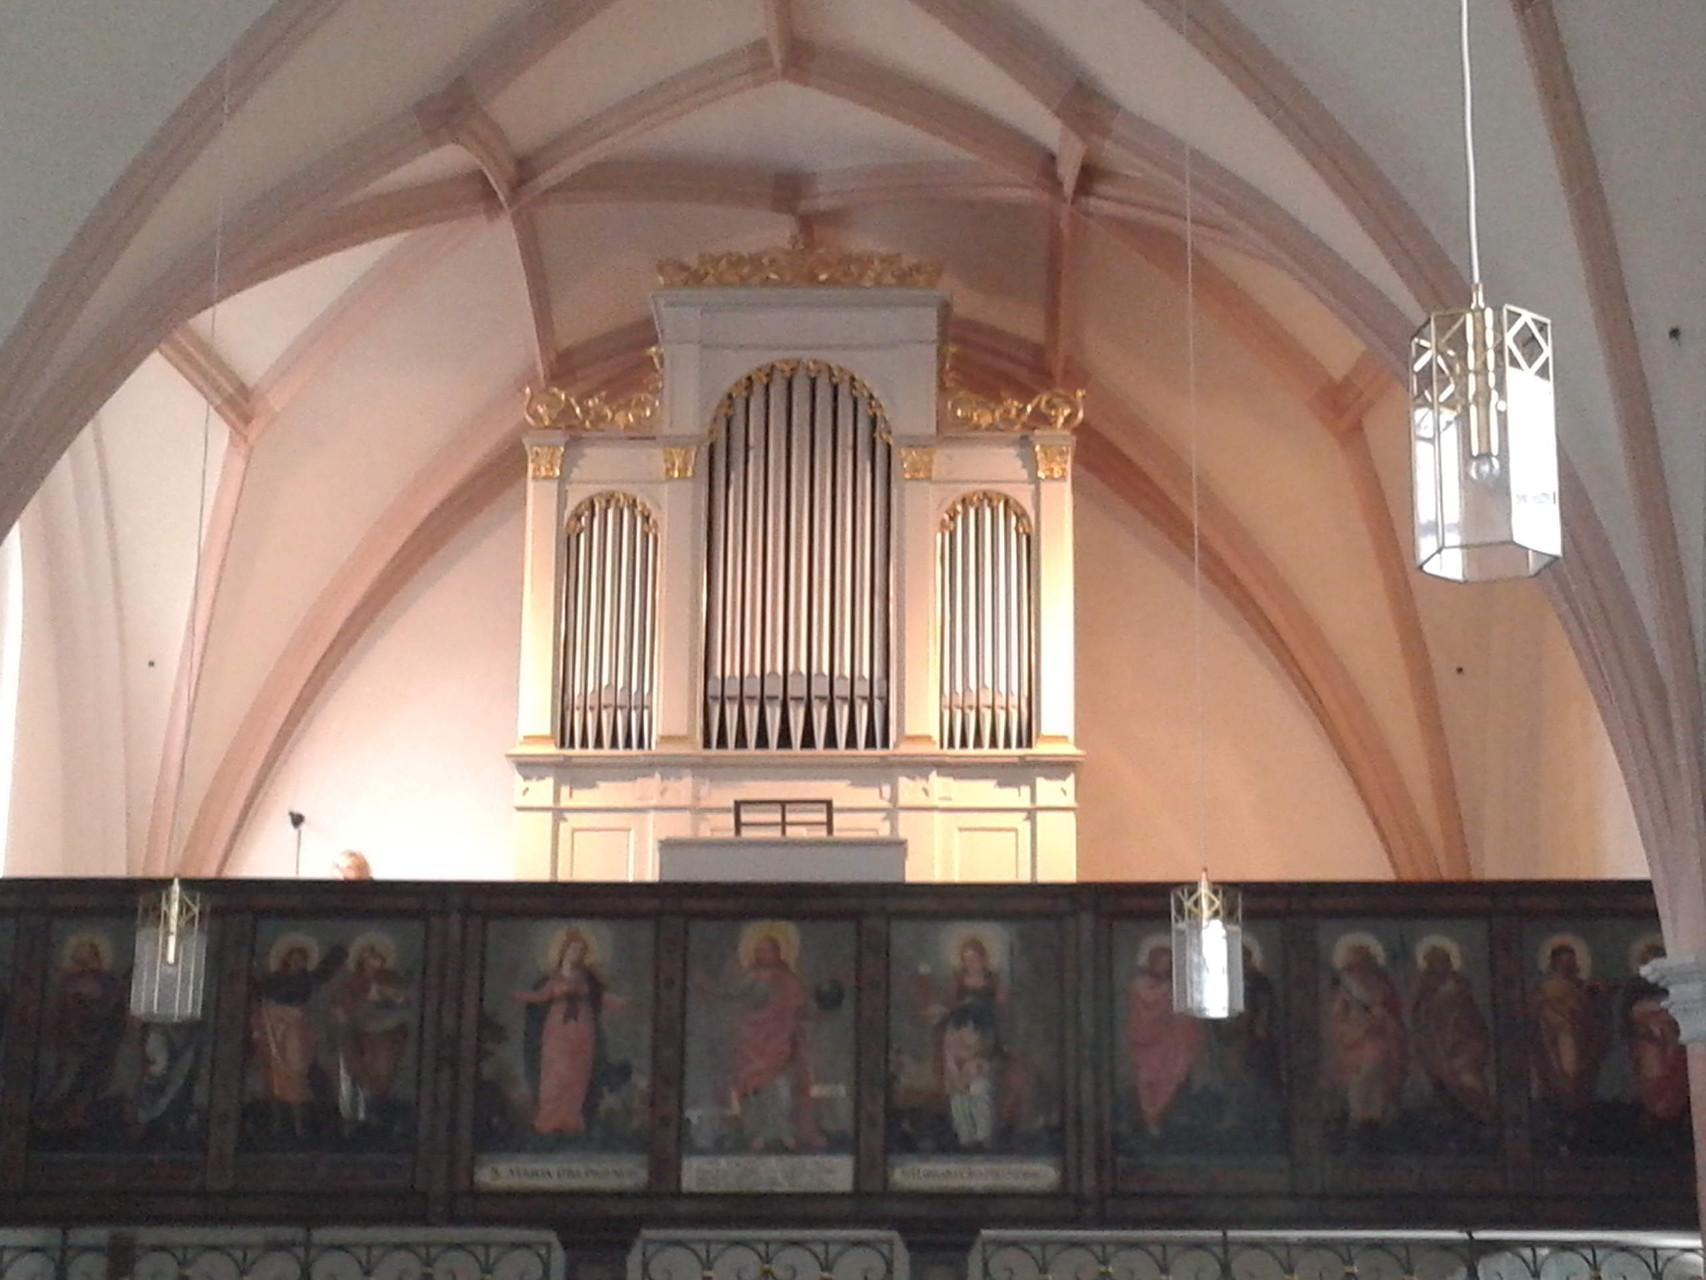 Vilshofen Friedhofskirche, Edenhofer-Orgel, I/12, Generalüberholung